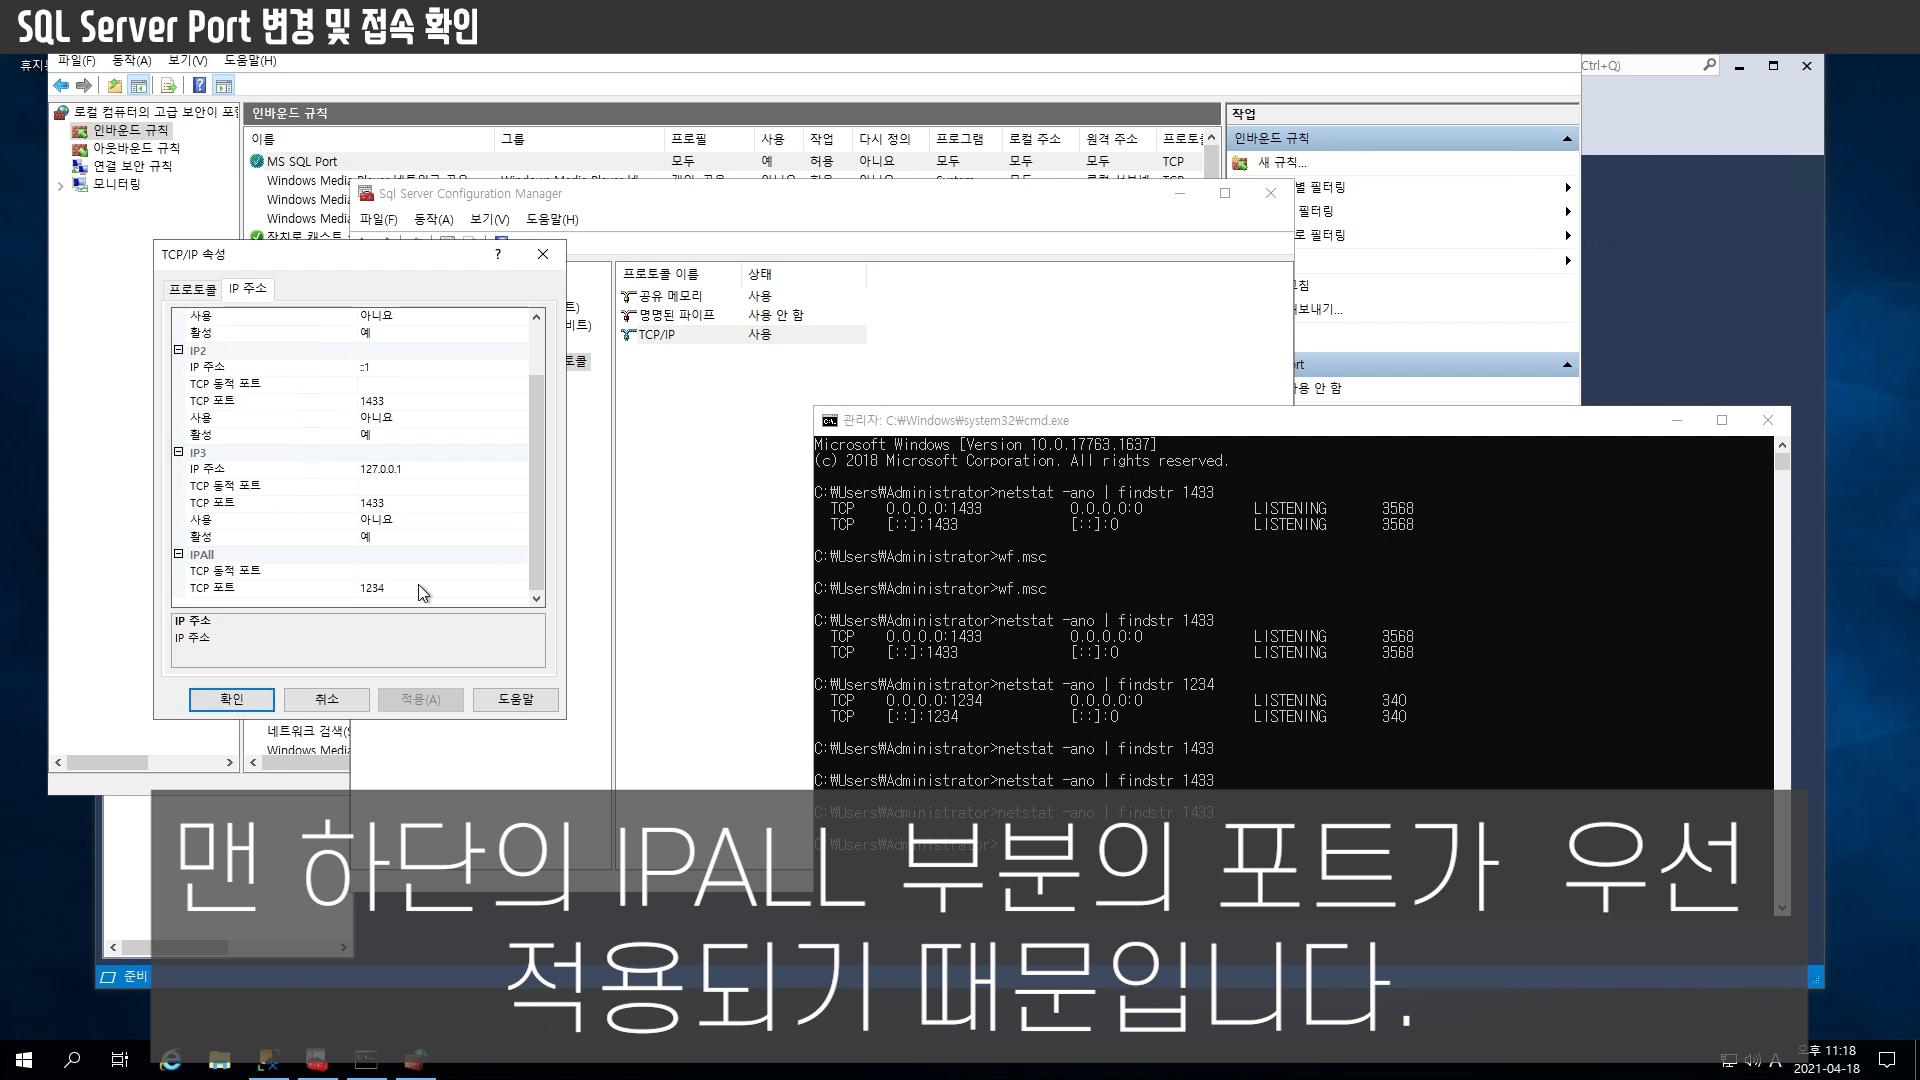 SQL Server 포트 변경.00_03_12_00.스틸 004.png